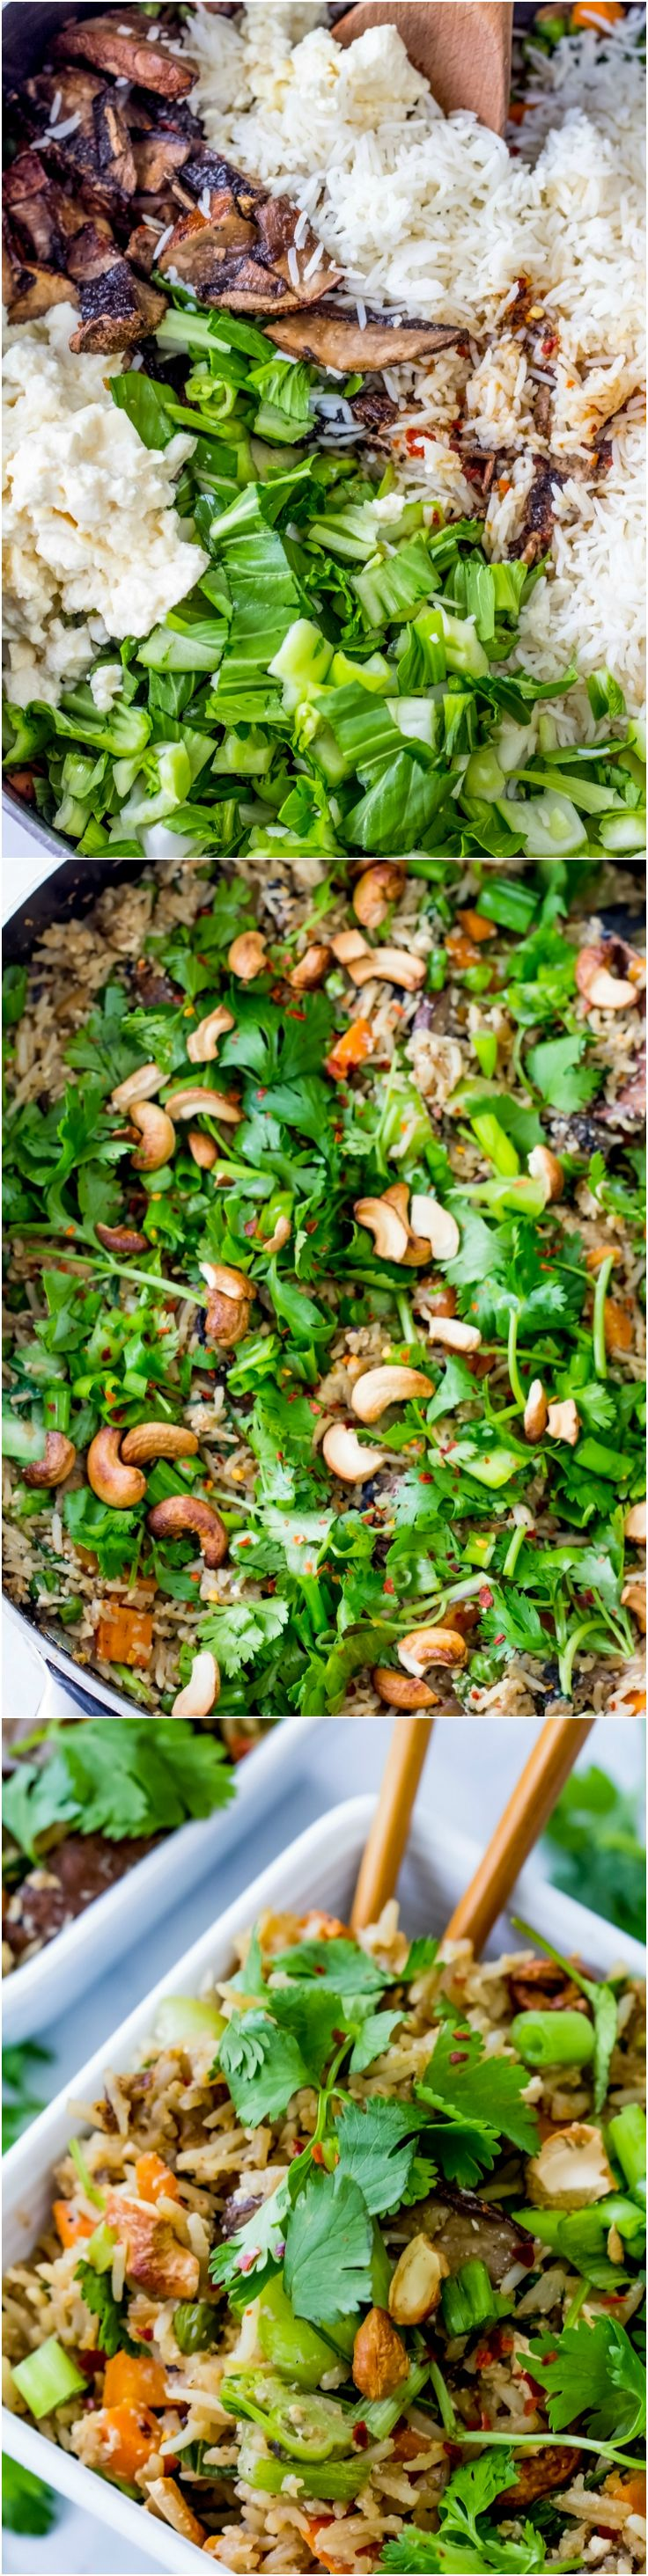 #Vegan Fried Rice made with roasted cashews, portobello mushroom steaks, tofu, and lots of veggies.